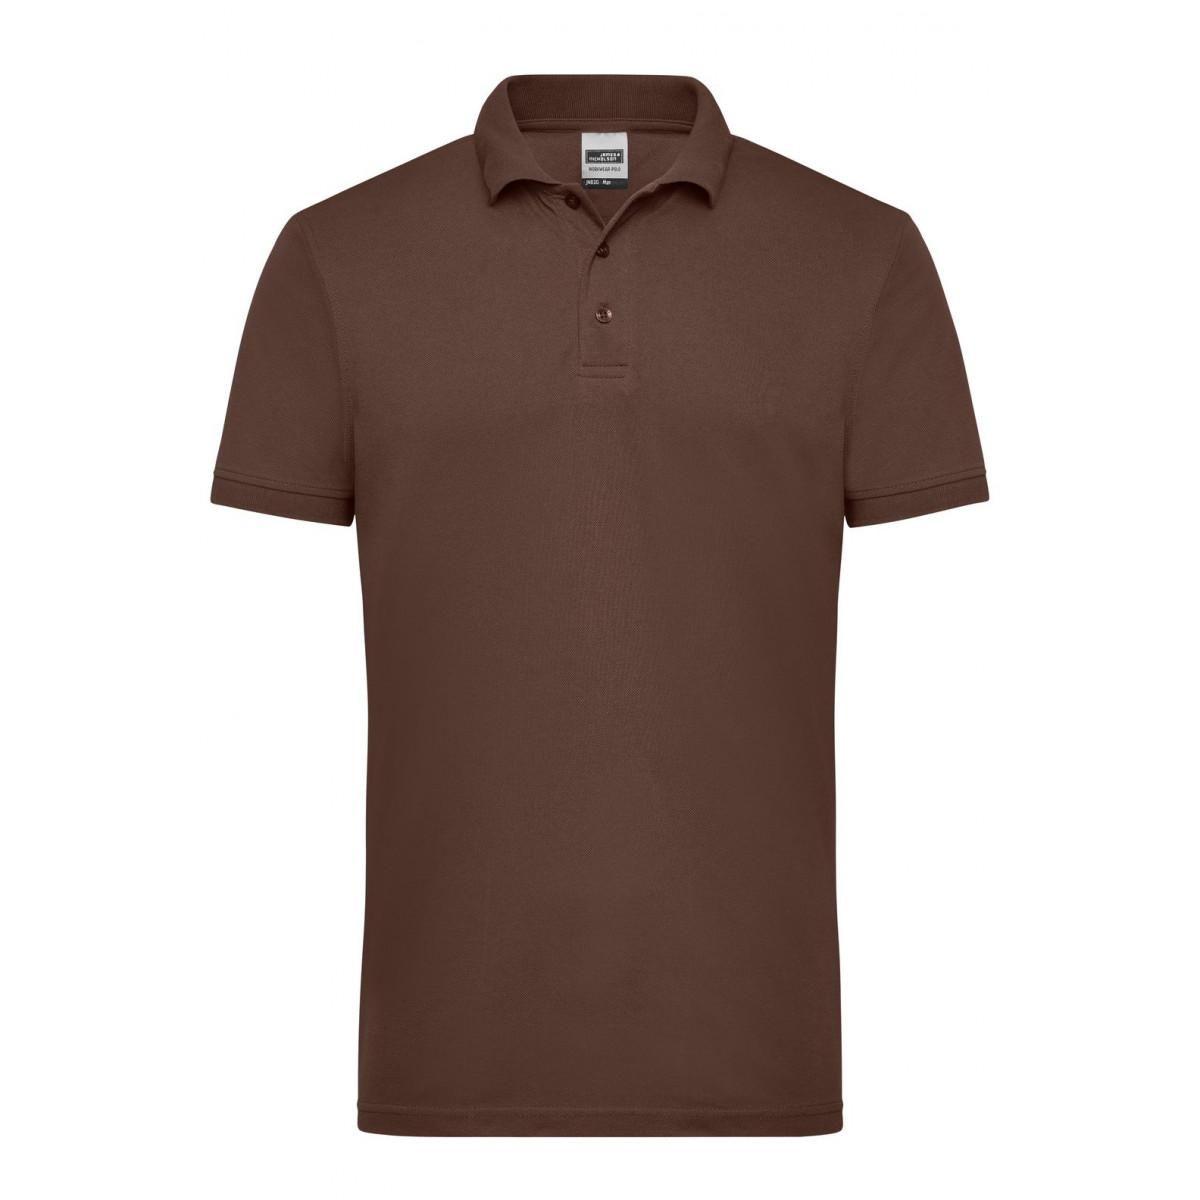 Рубашка поло мужская JN830 Mens Workwear Polo - Коричневый